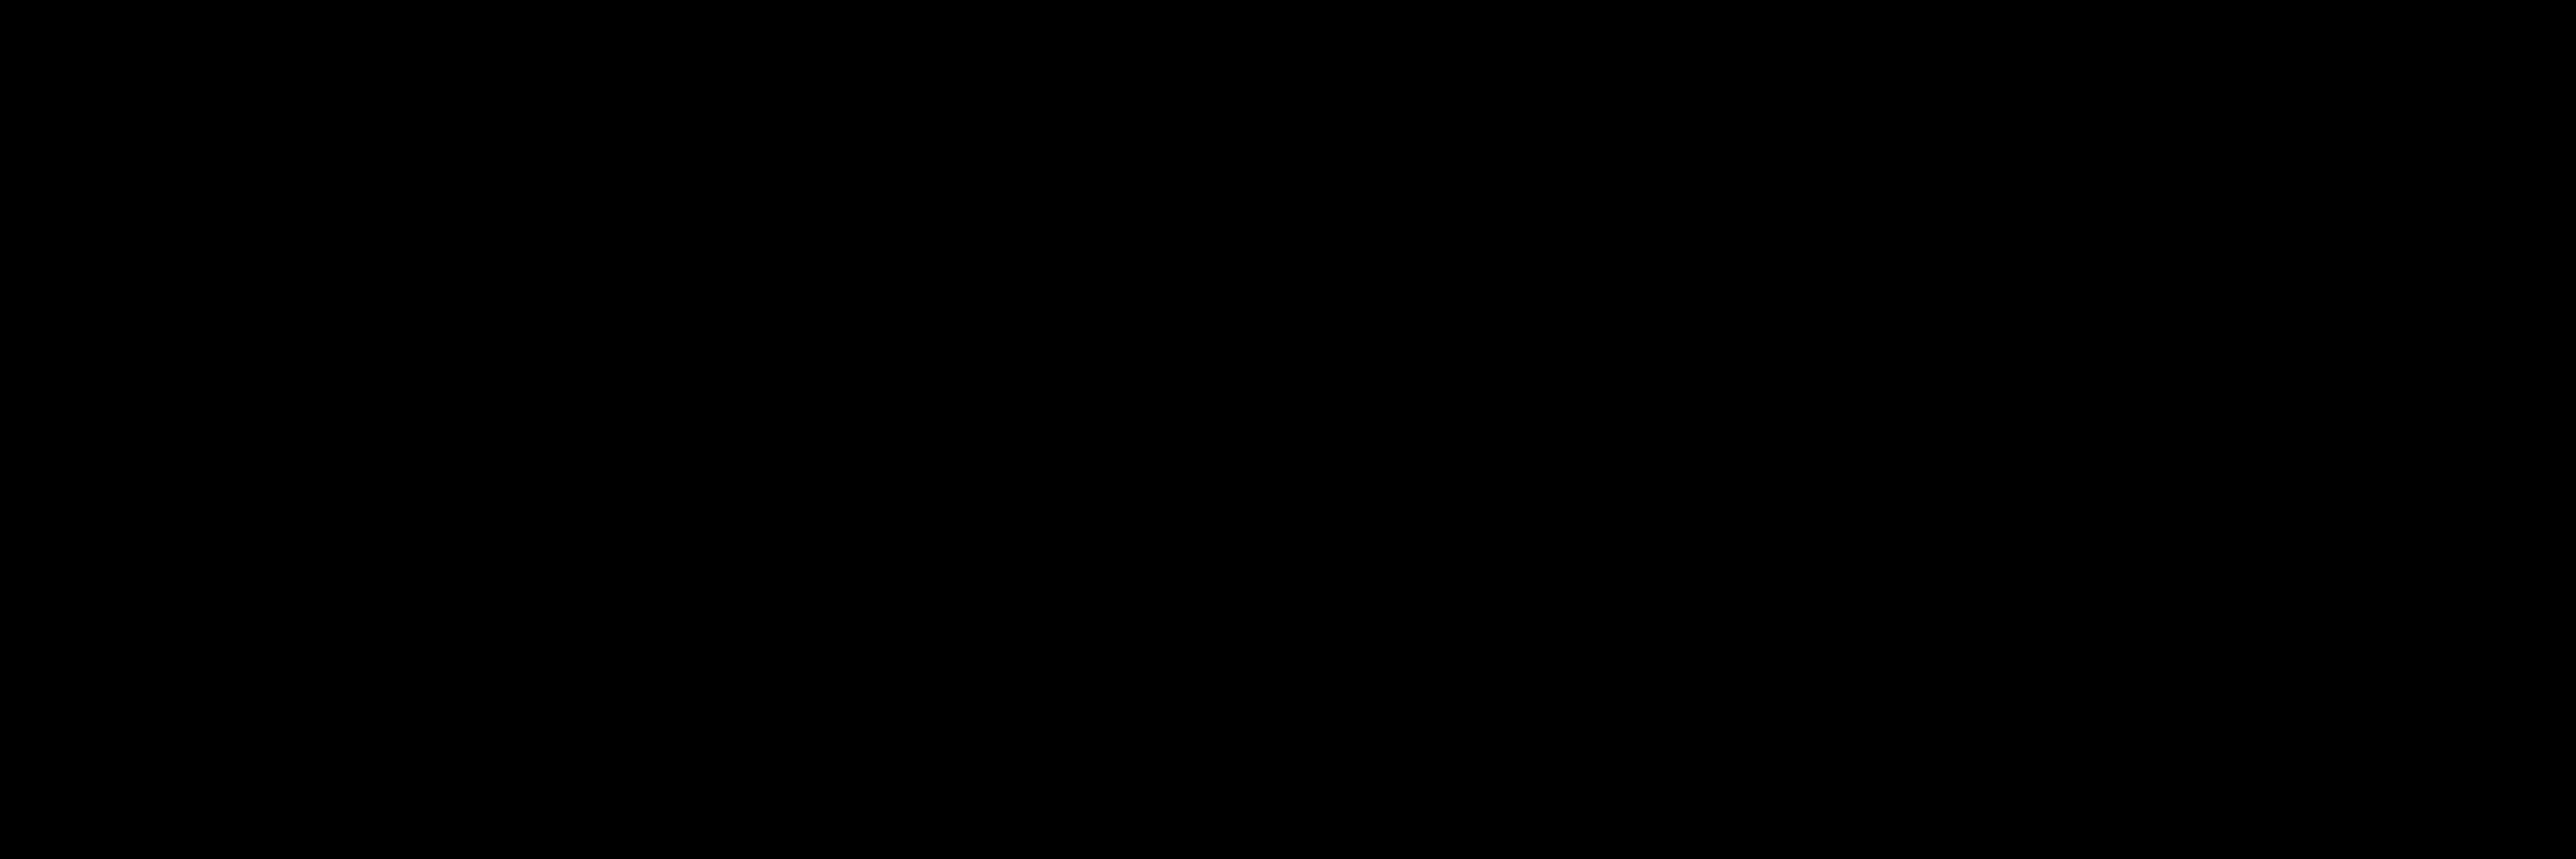 Orest Black Logo